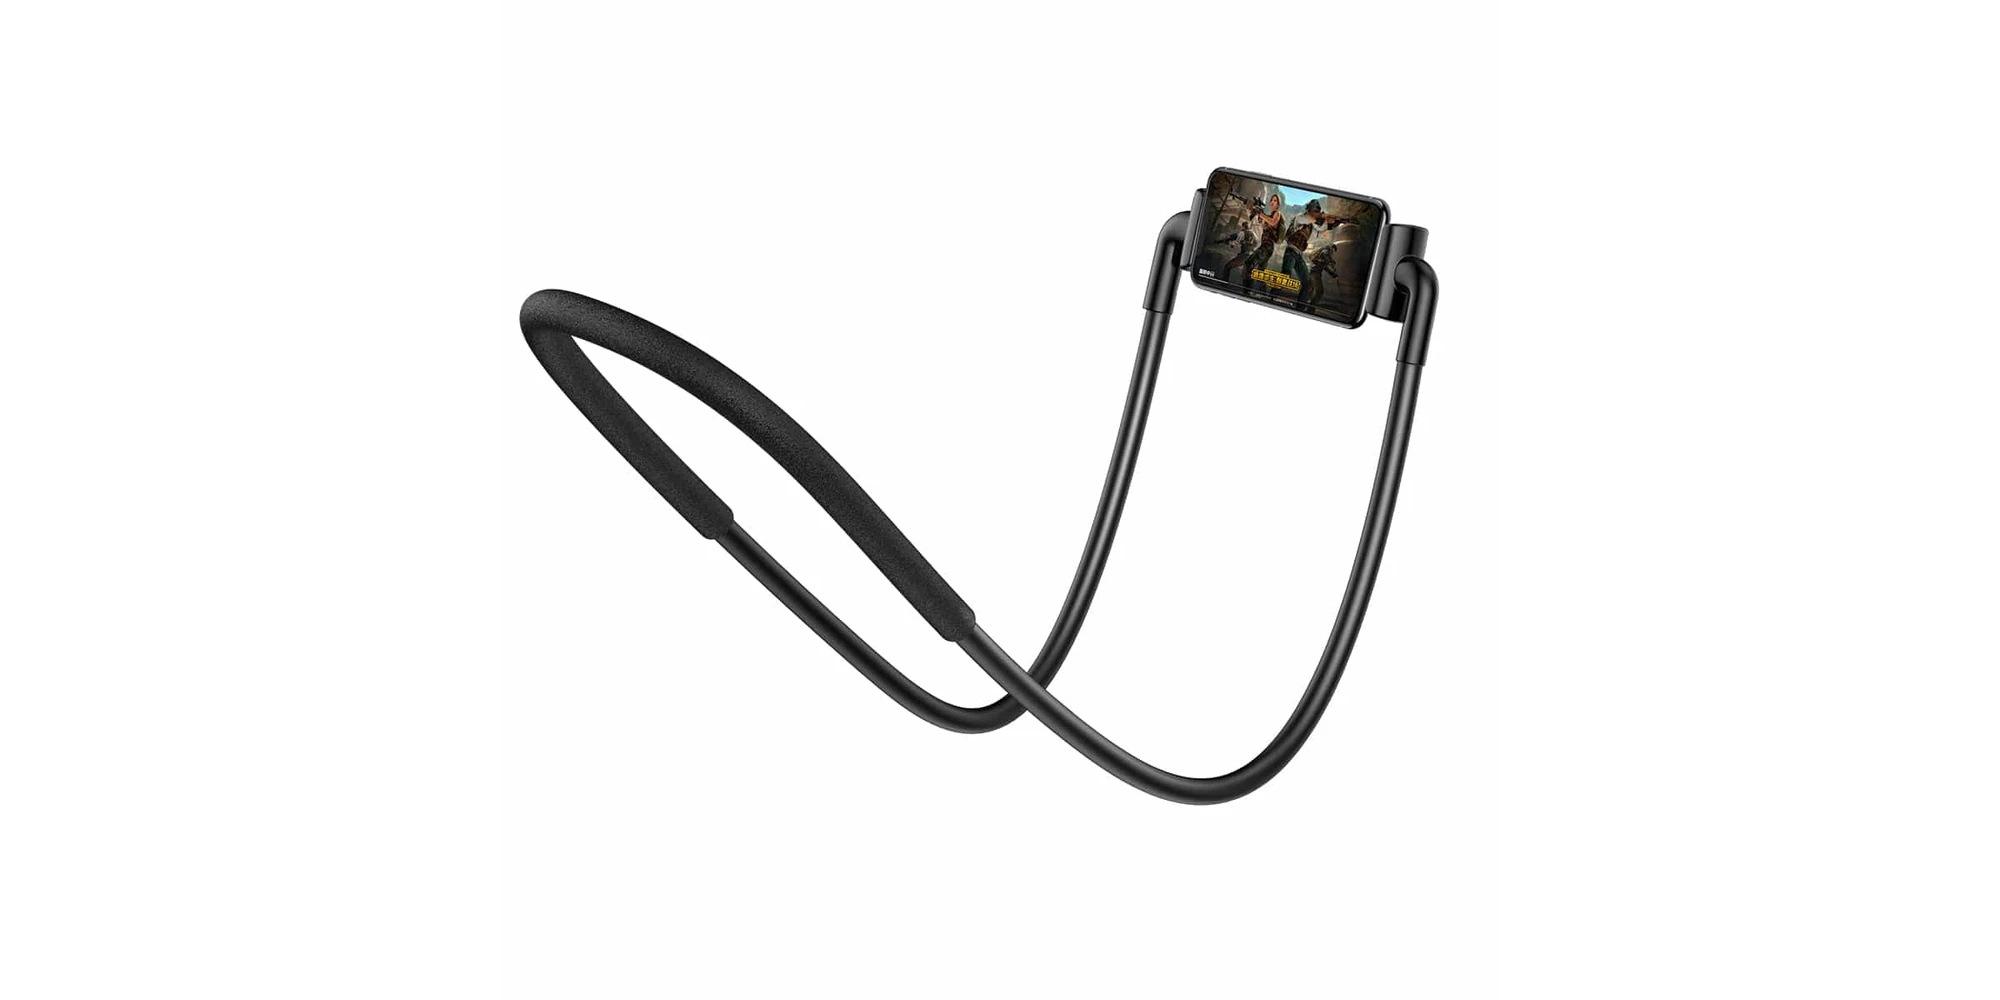 Baseus New Neck-Mounted Lazy Bracket - أفضل حوامل الهاتف